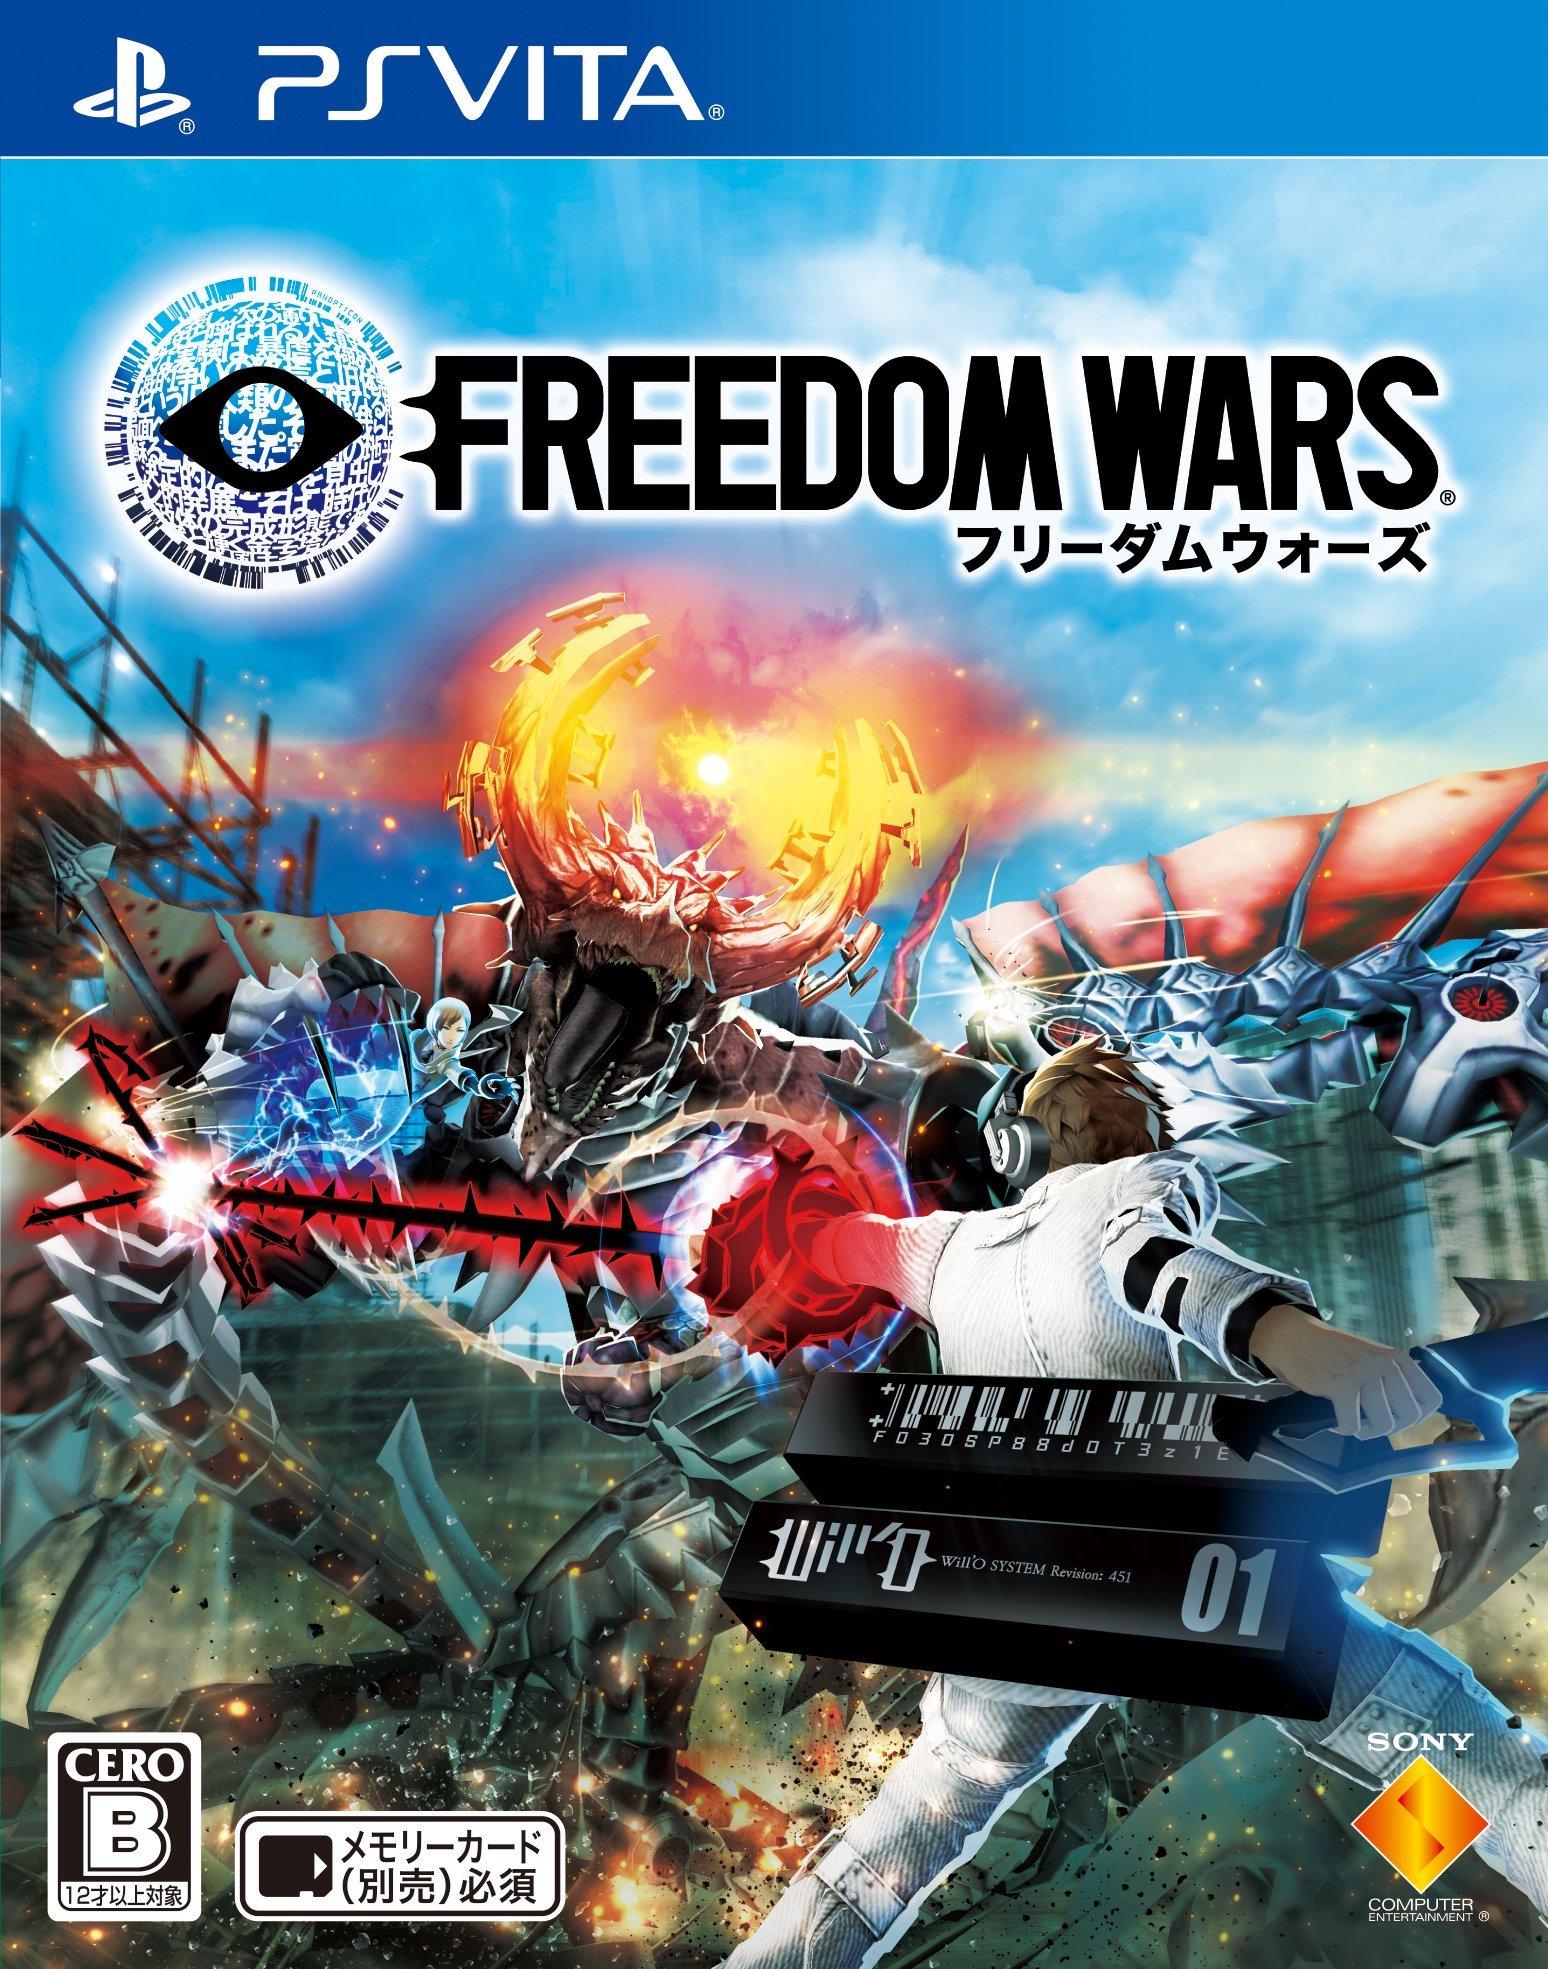 Freedom wars | Otaku lvl up!